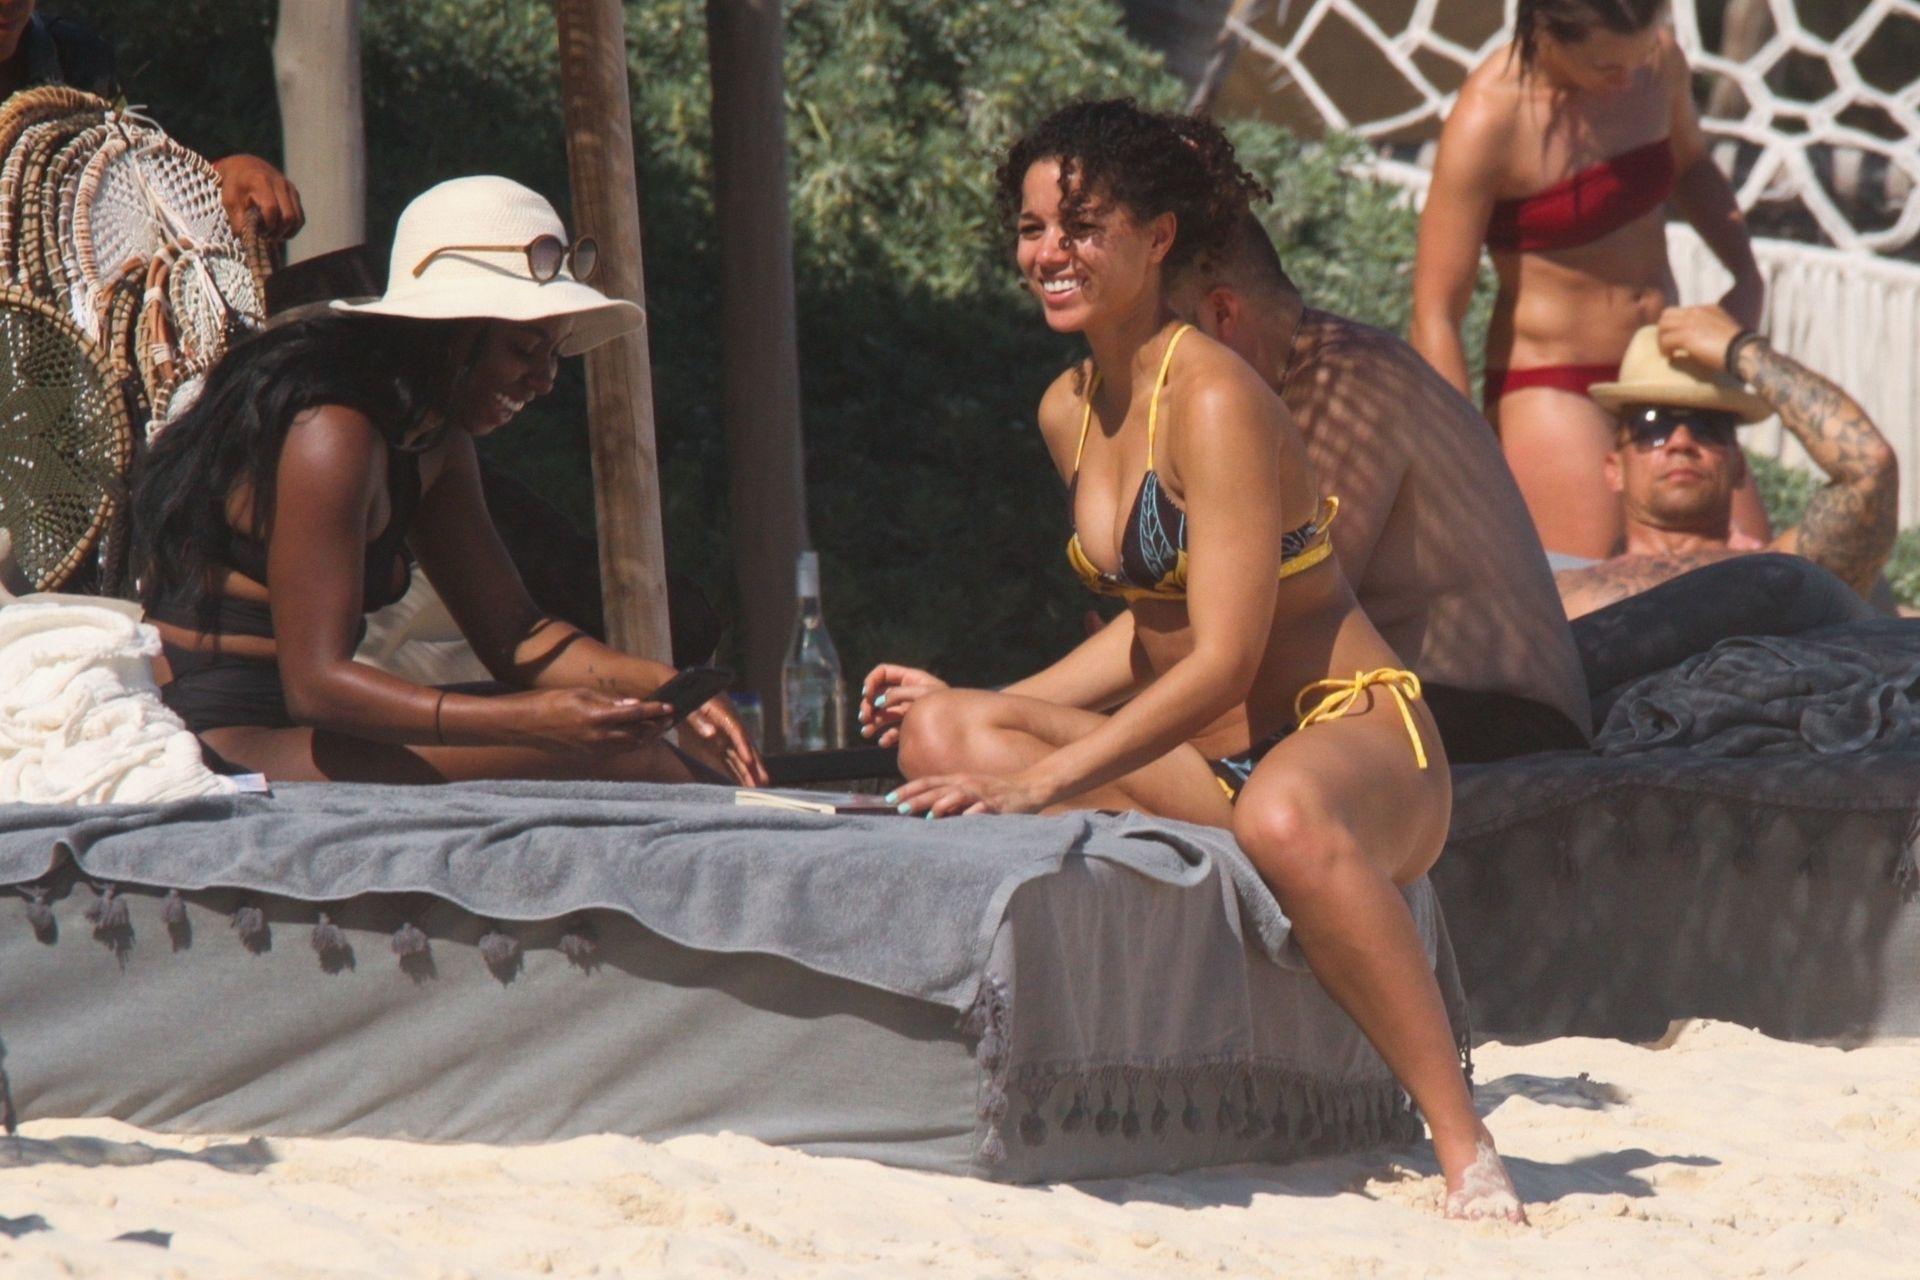 Alisha Wainwright Enjoys A Sun Filled Getaway In Tulum 0051